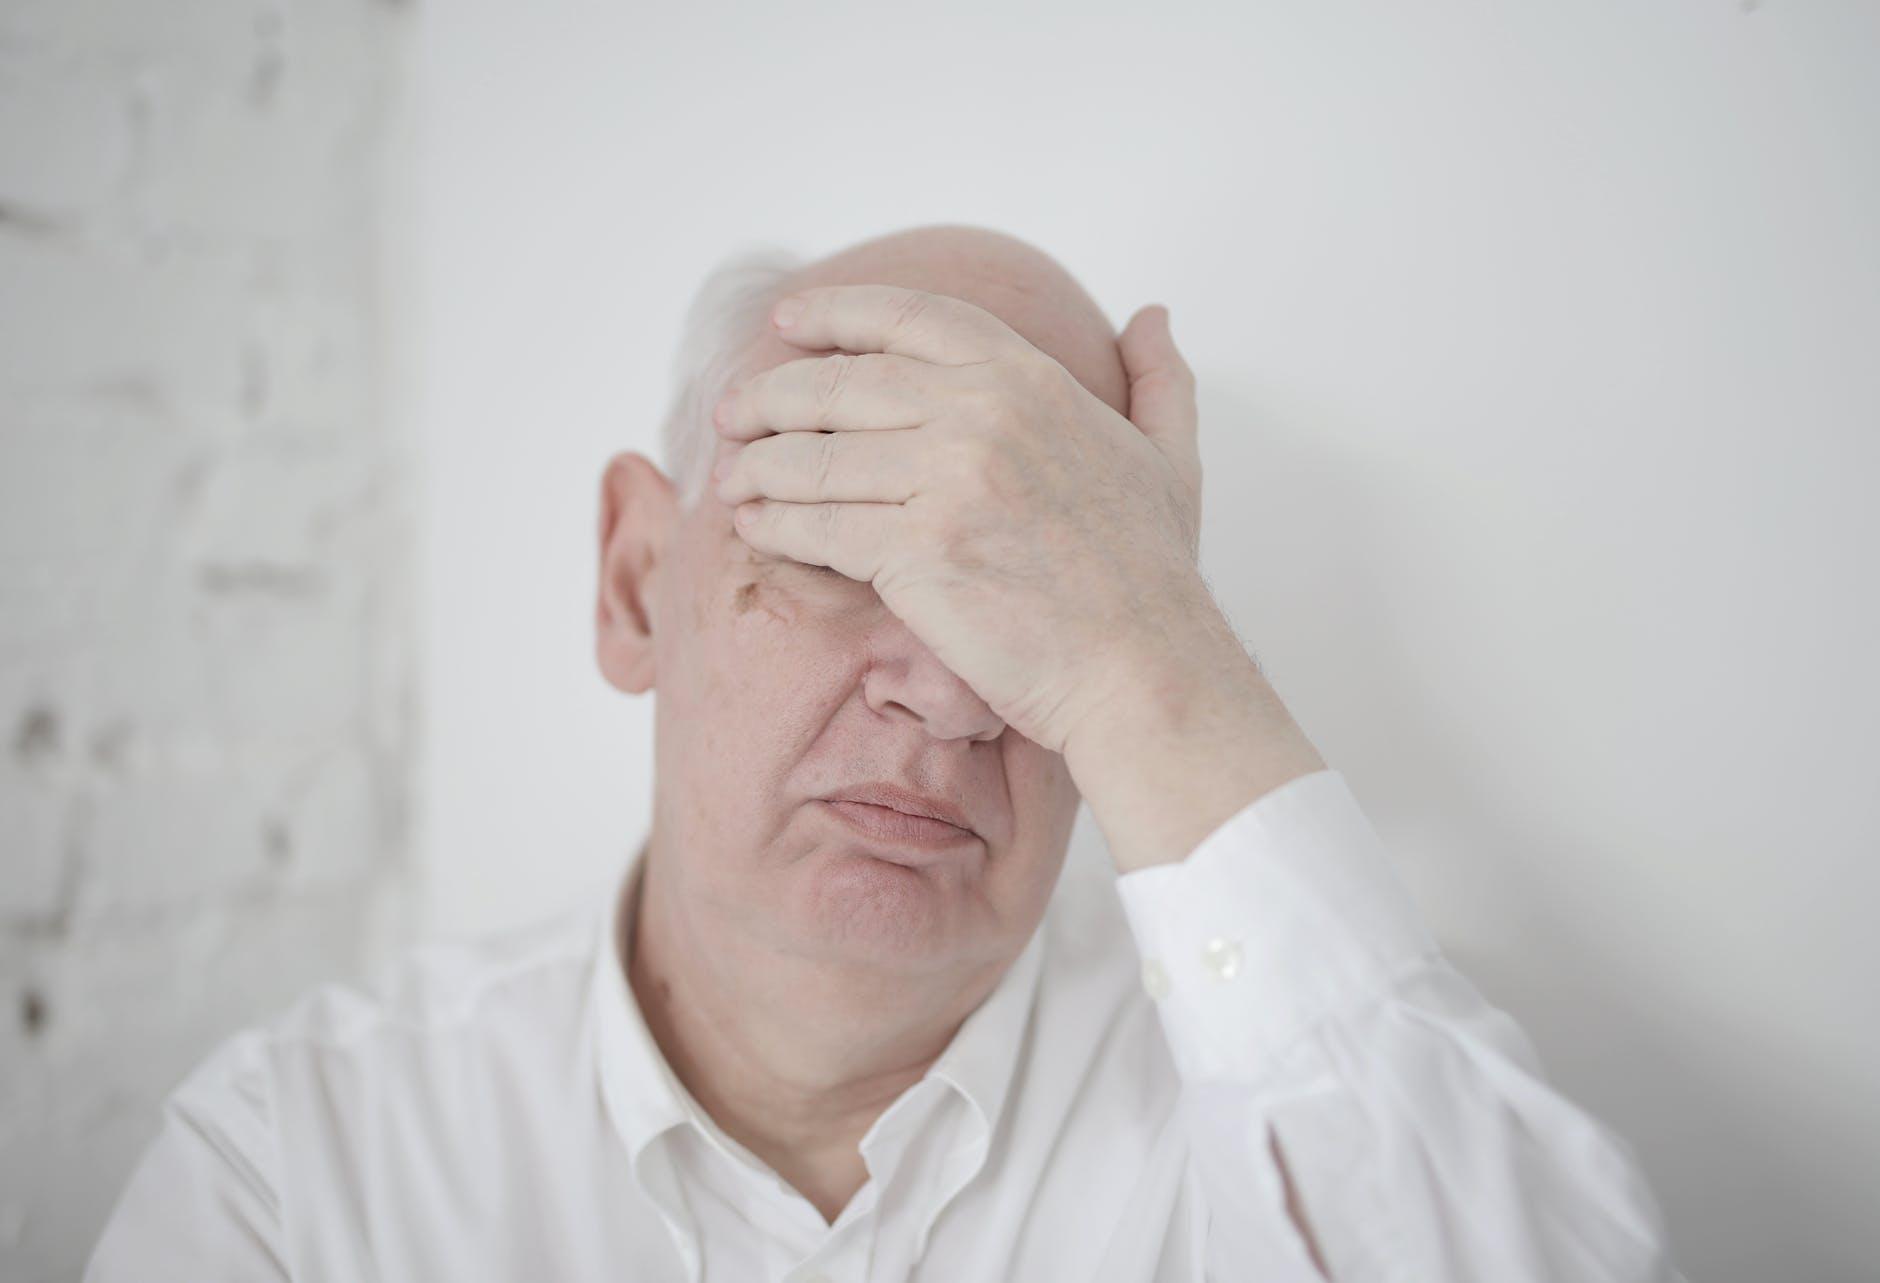 senior hand on face